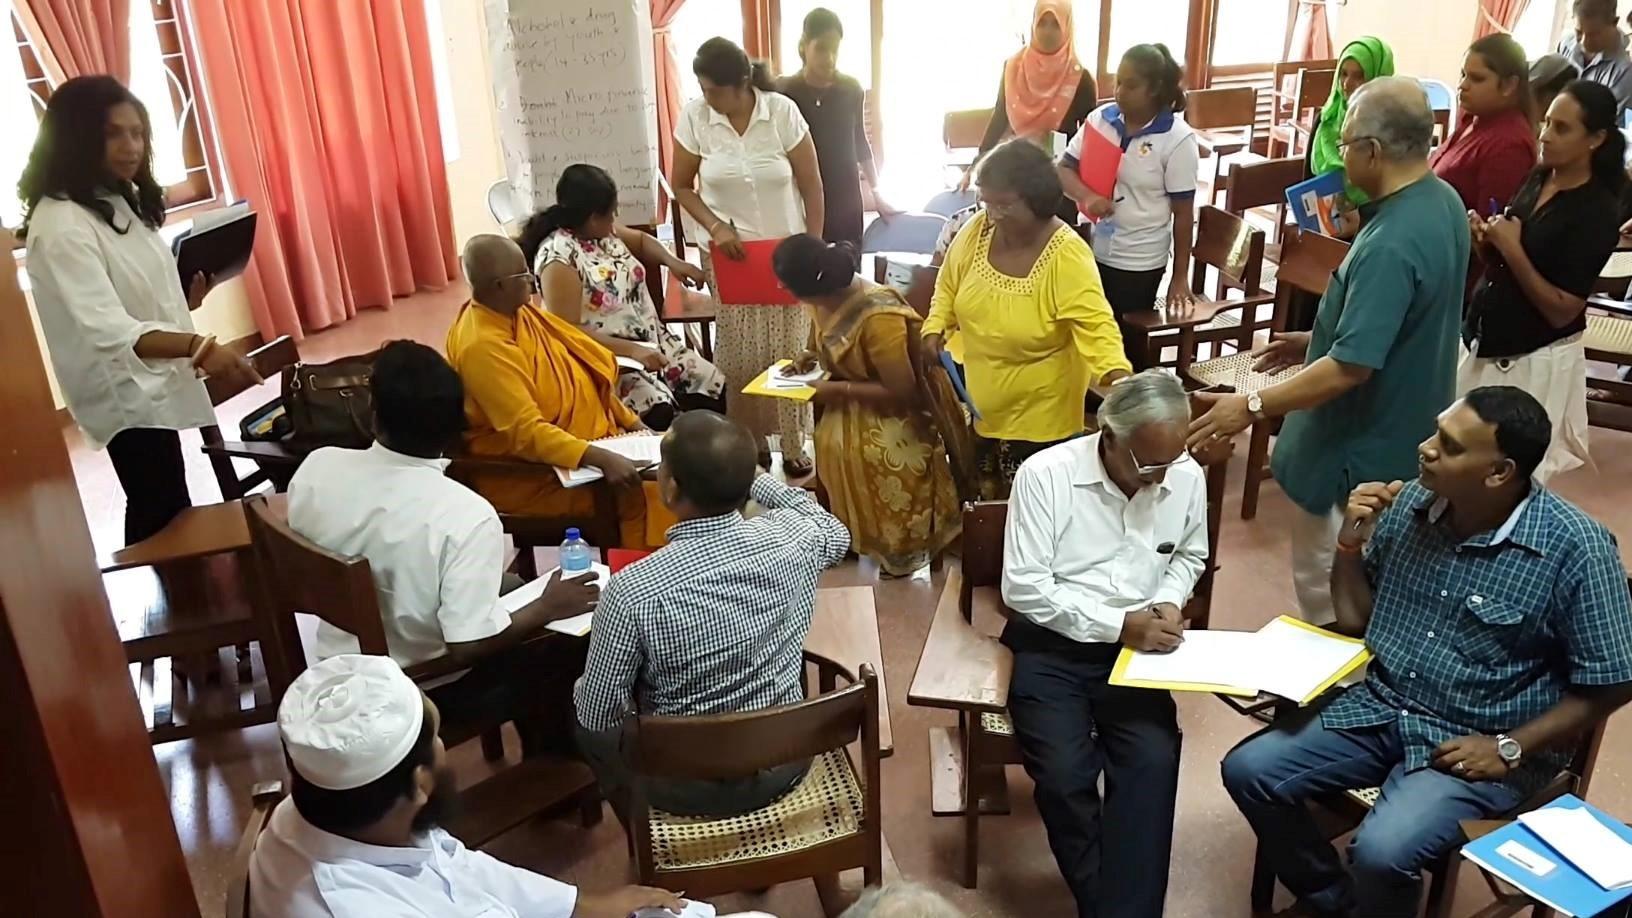 A Peacemaker Team in Sri Lanka sitting at desks working together